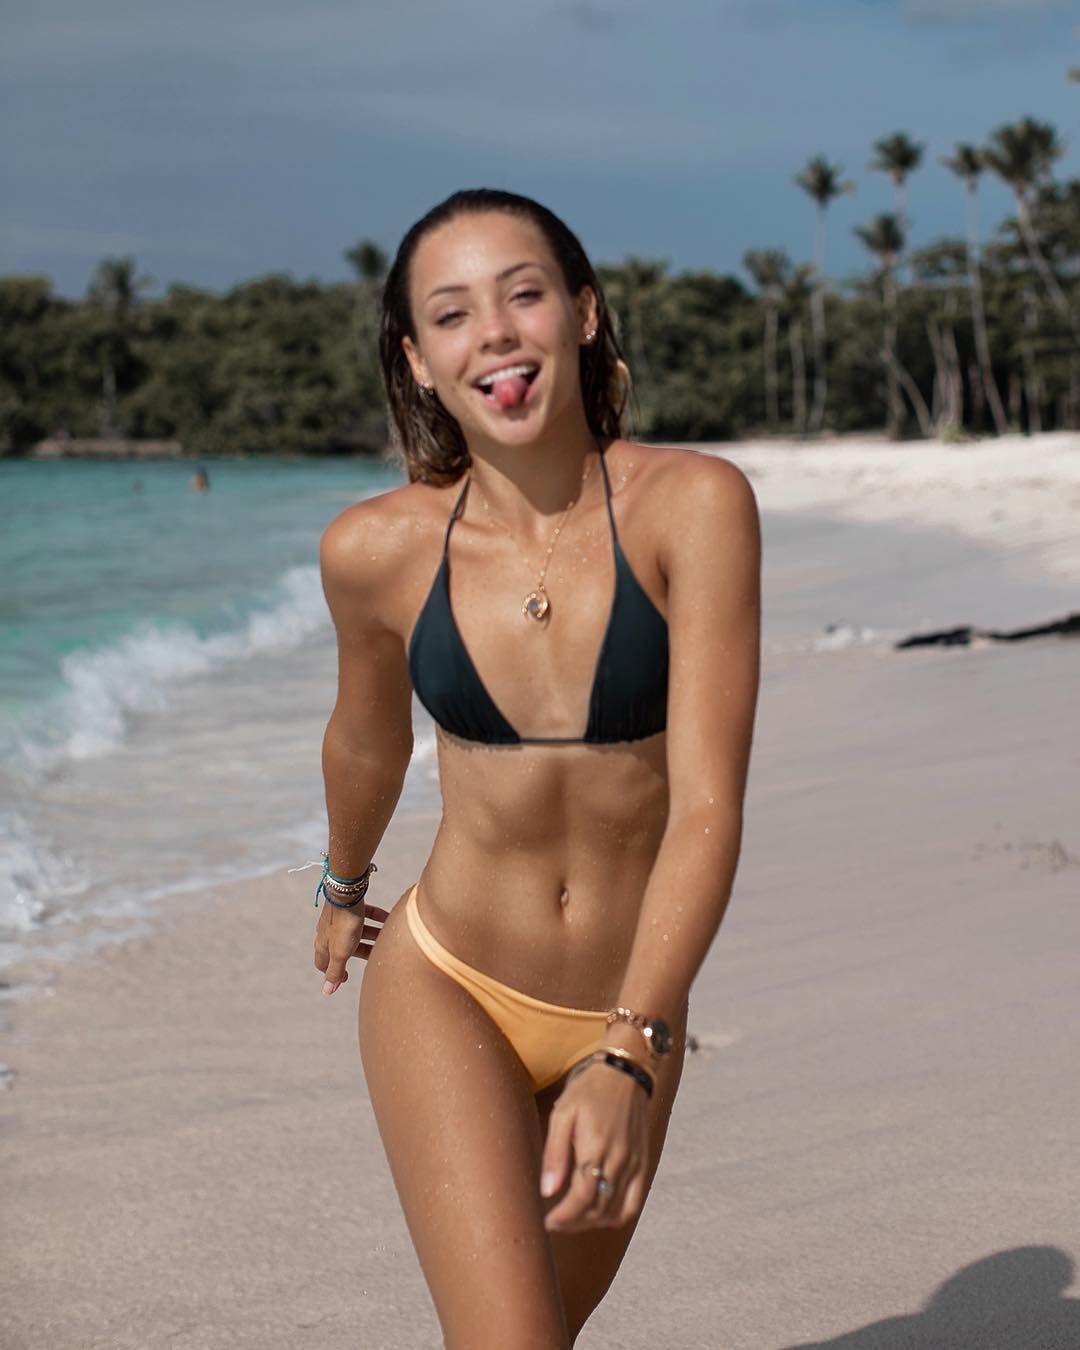 Paparazzi Charly Jordan nude (89 photos), Tits, Paparazzi, Instagram, legs 2018